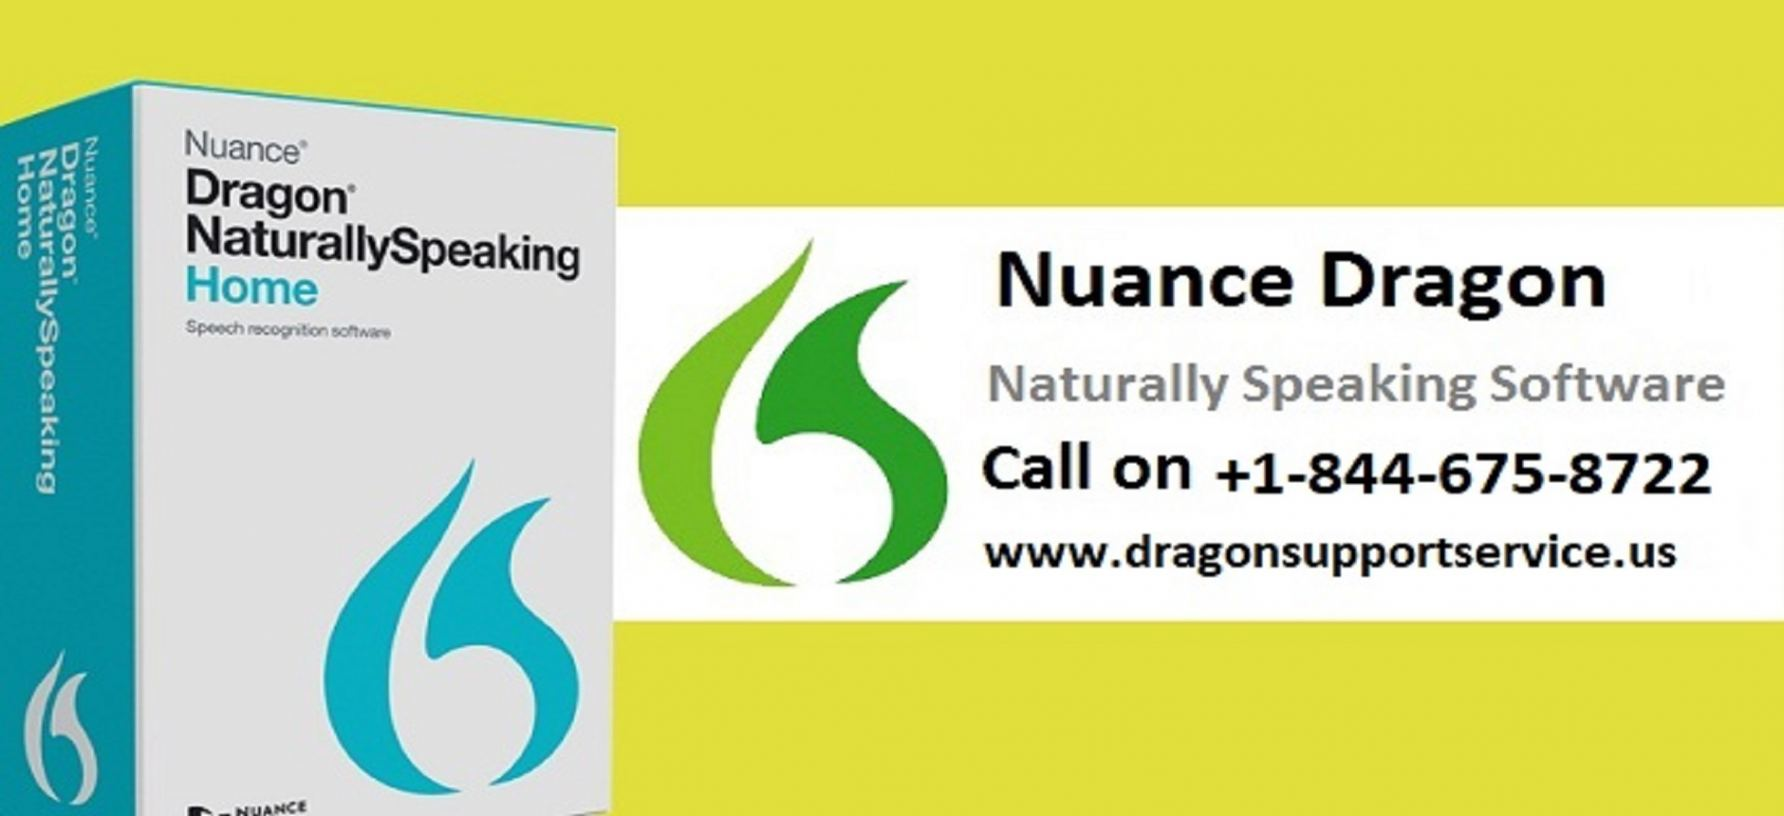 dragon-naturally-speaking-software